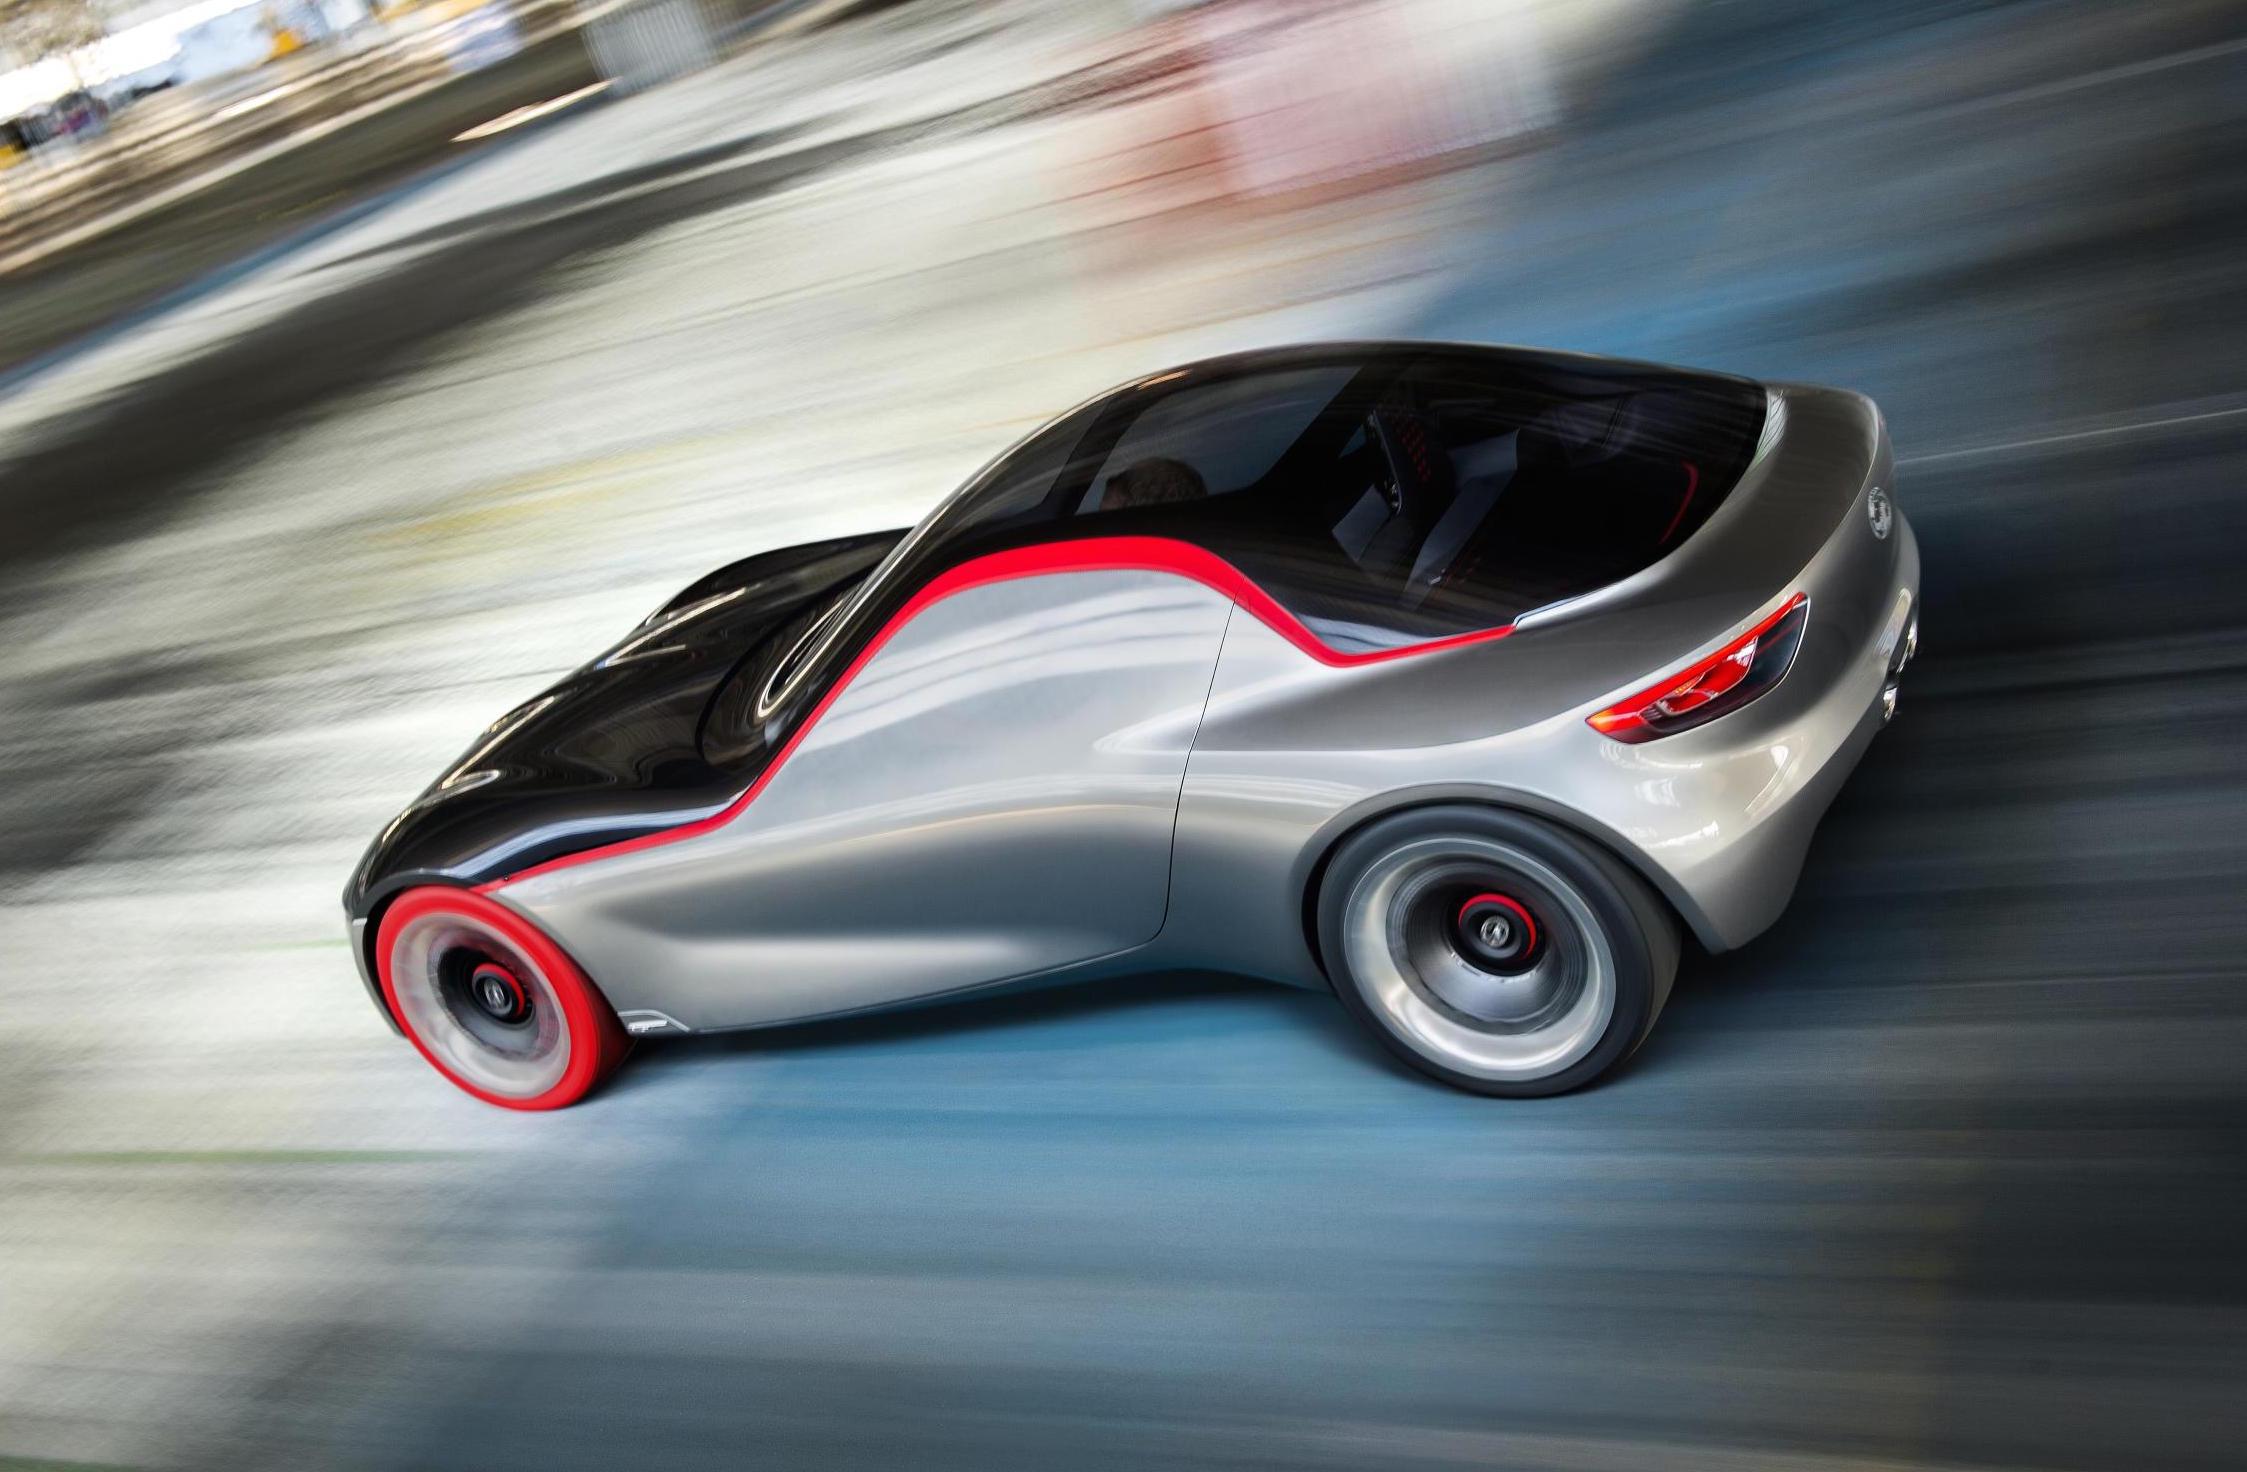 Opel Gt Concept Revealed 10l Turbo Rwd 1000kg Performancedrive Fuse Box 2016 Top